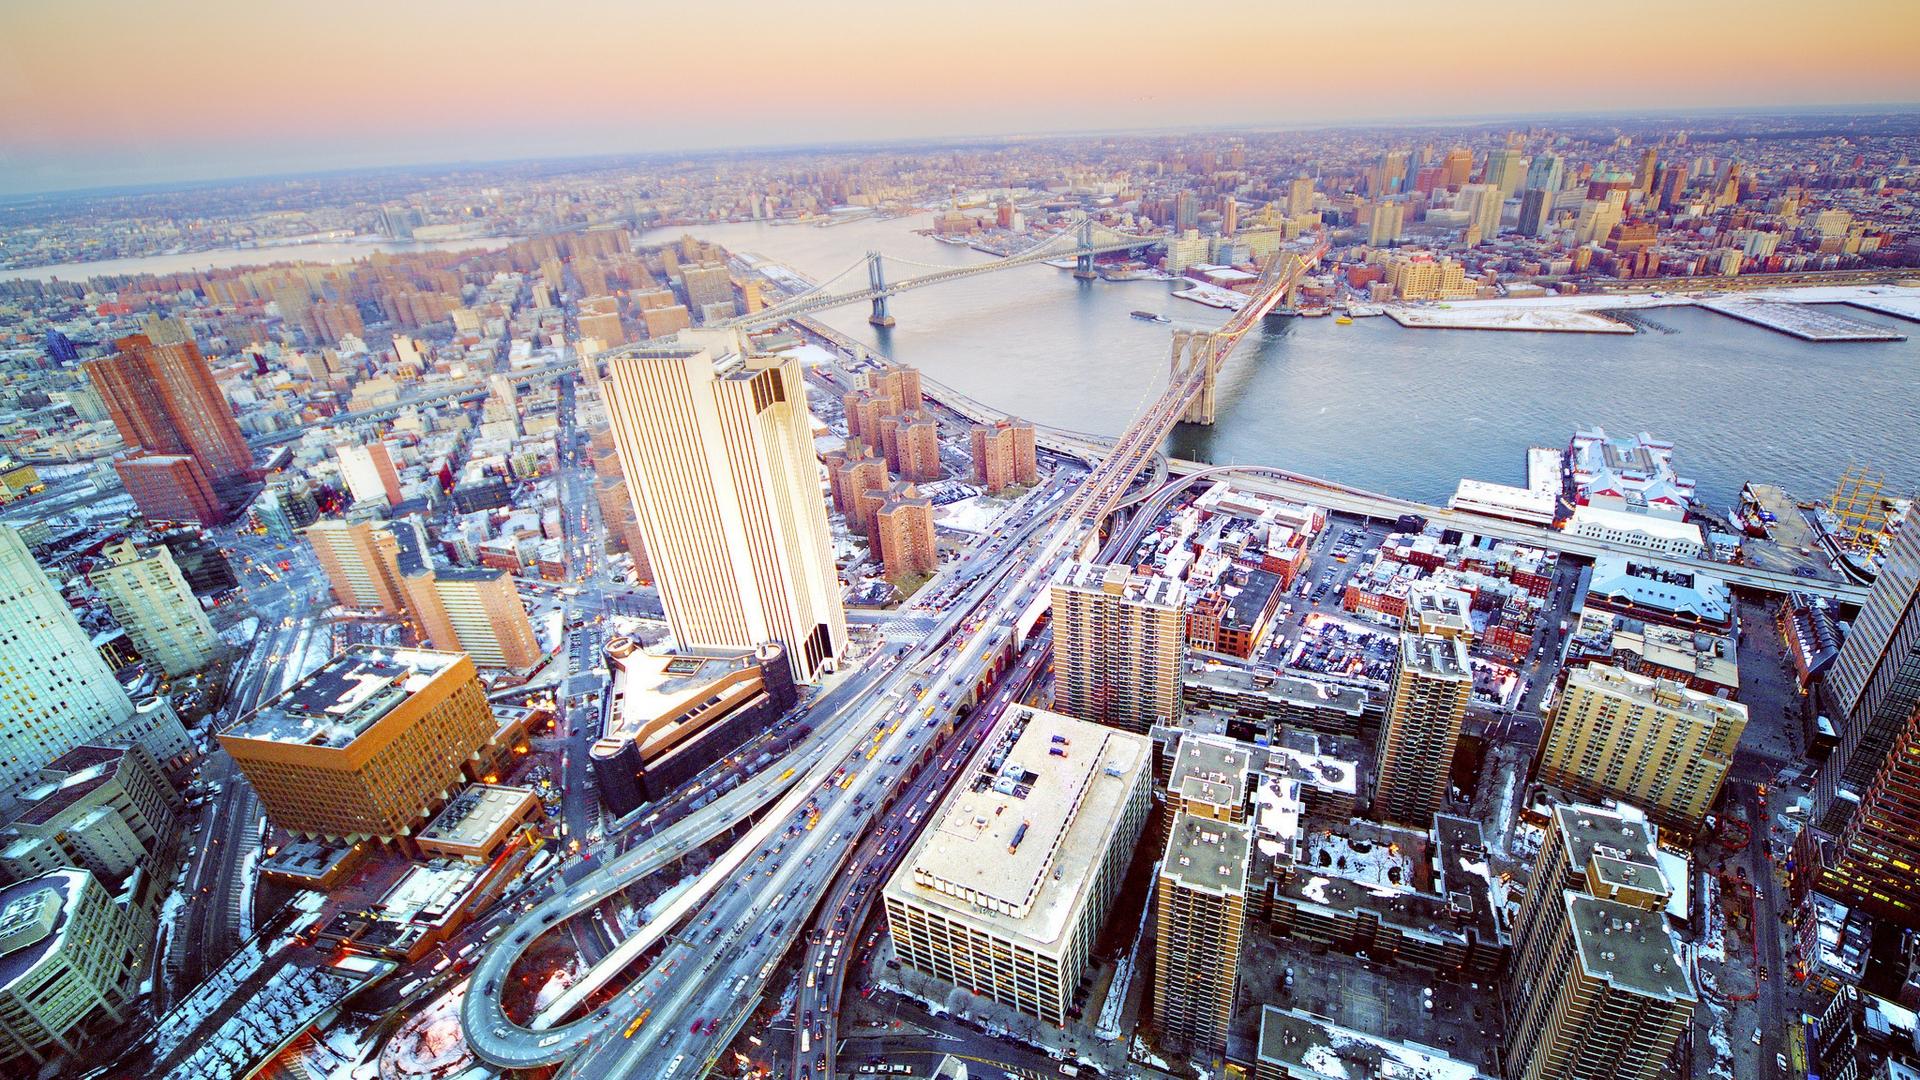 река, мосты, улицы